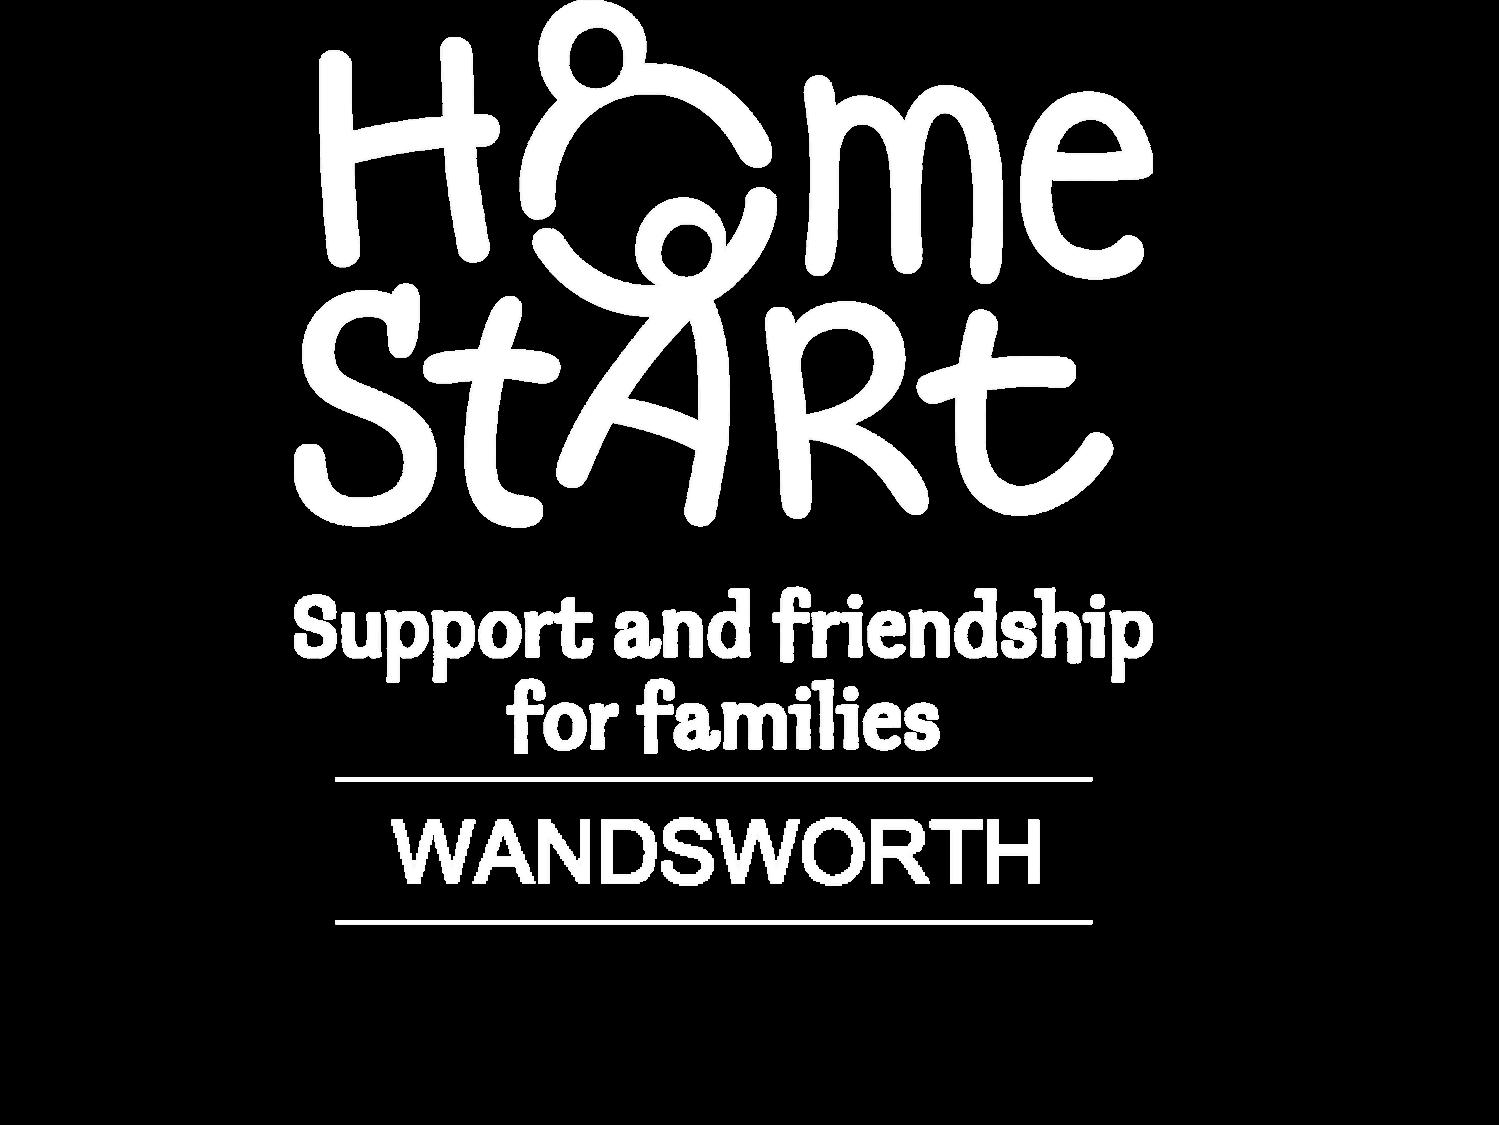 Home-Start Wandsworth